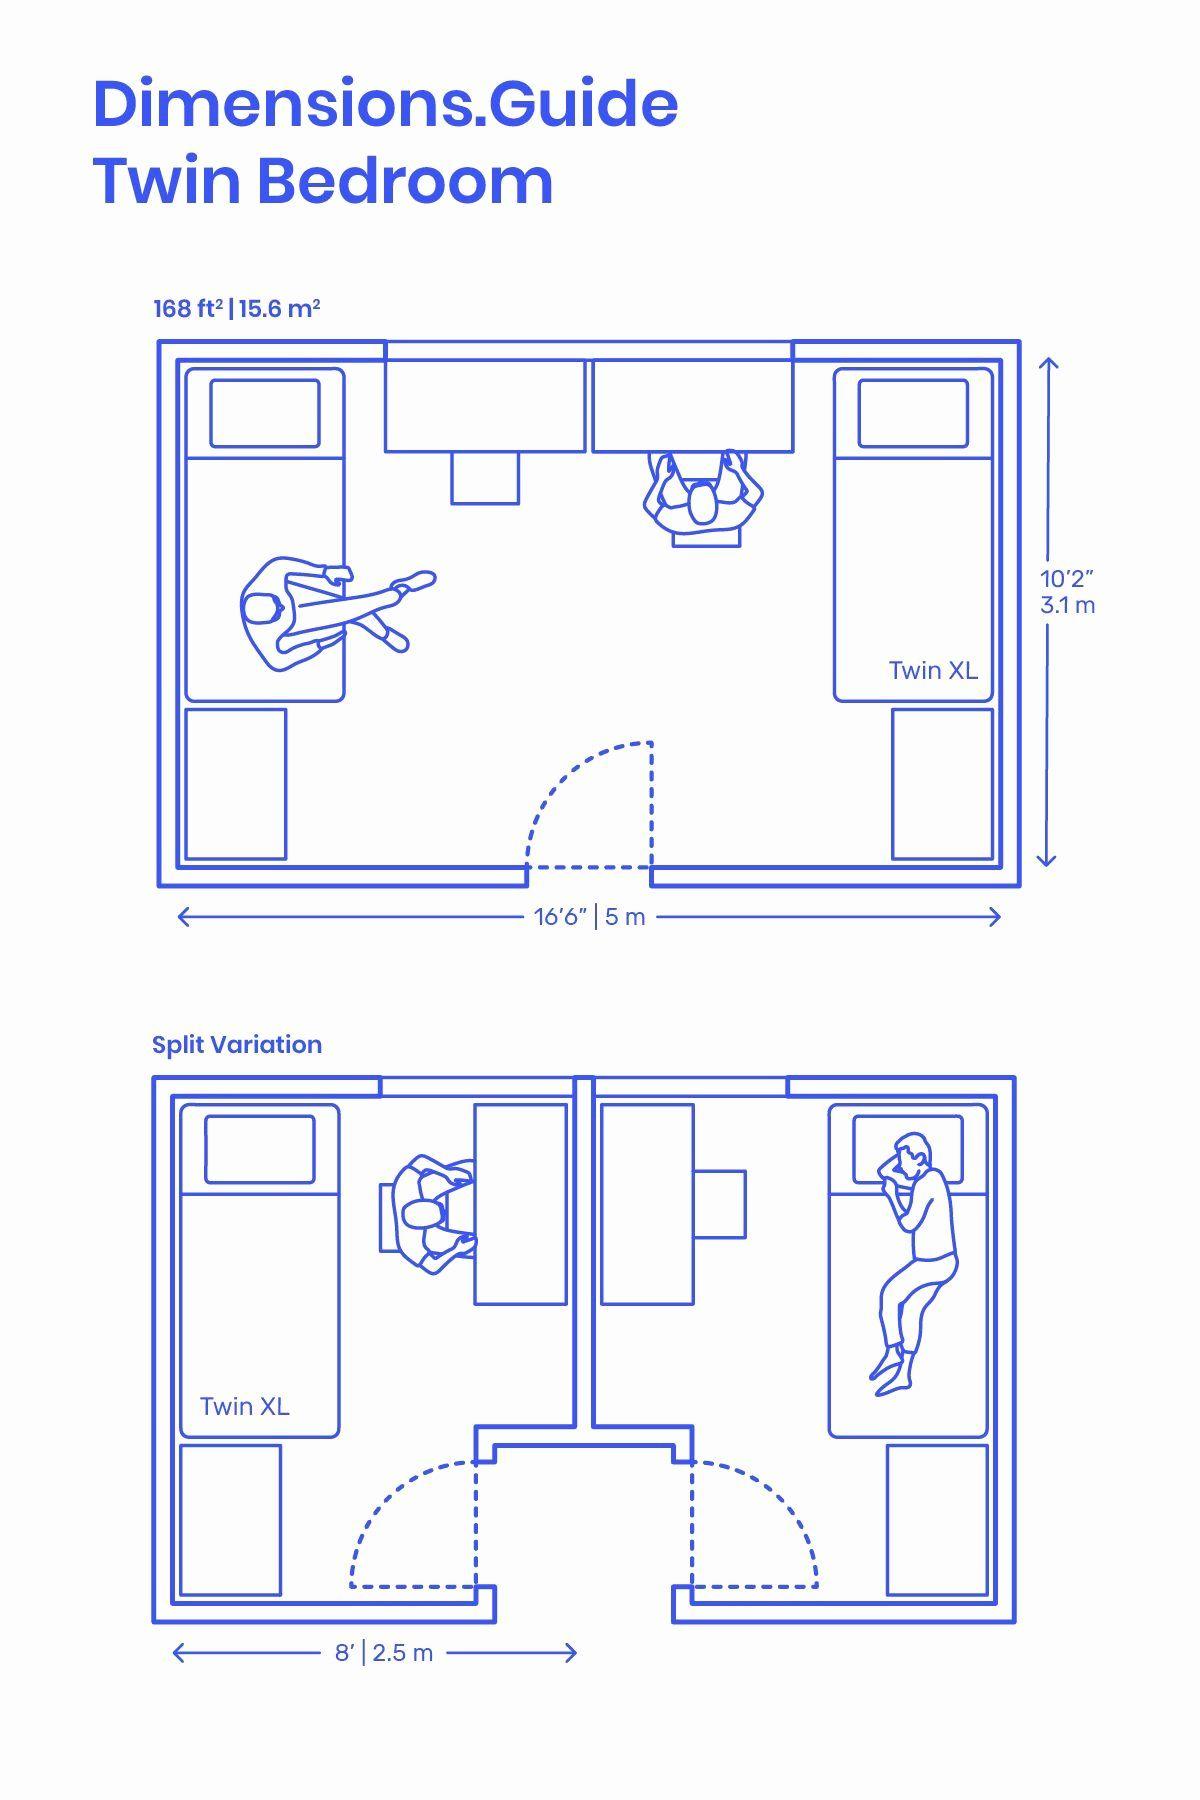 11 By 12 Bedroom Layouts : bedroom, layouts, Bedroom, Layouts, Fresh, Layouts,, Floor, Plans,